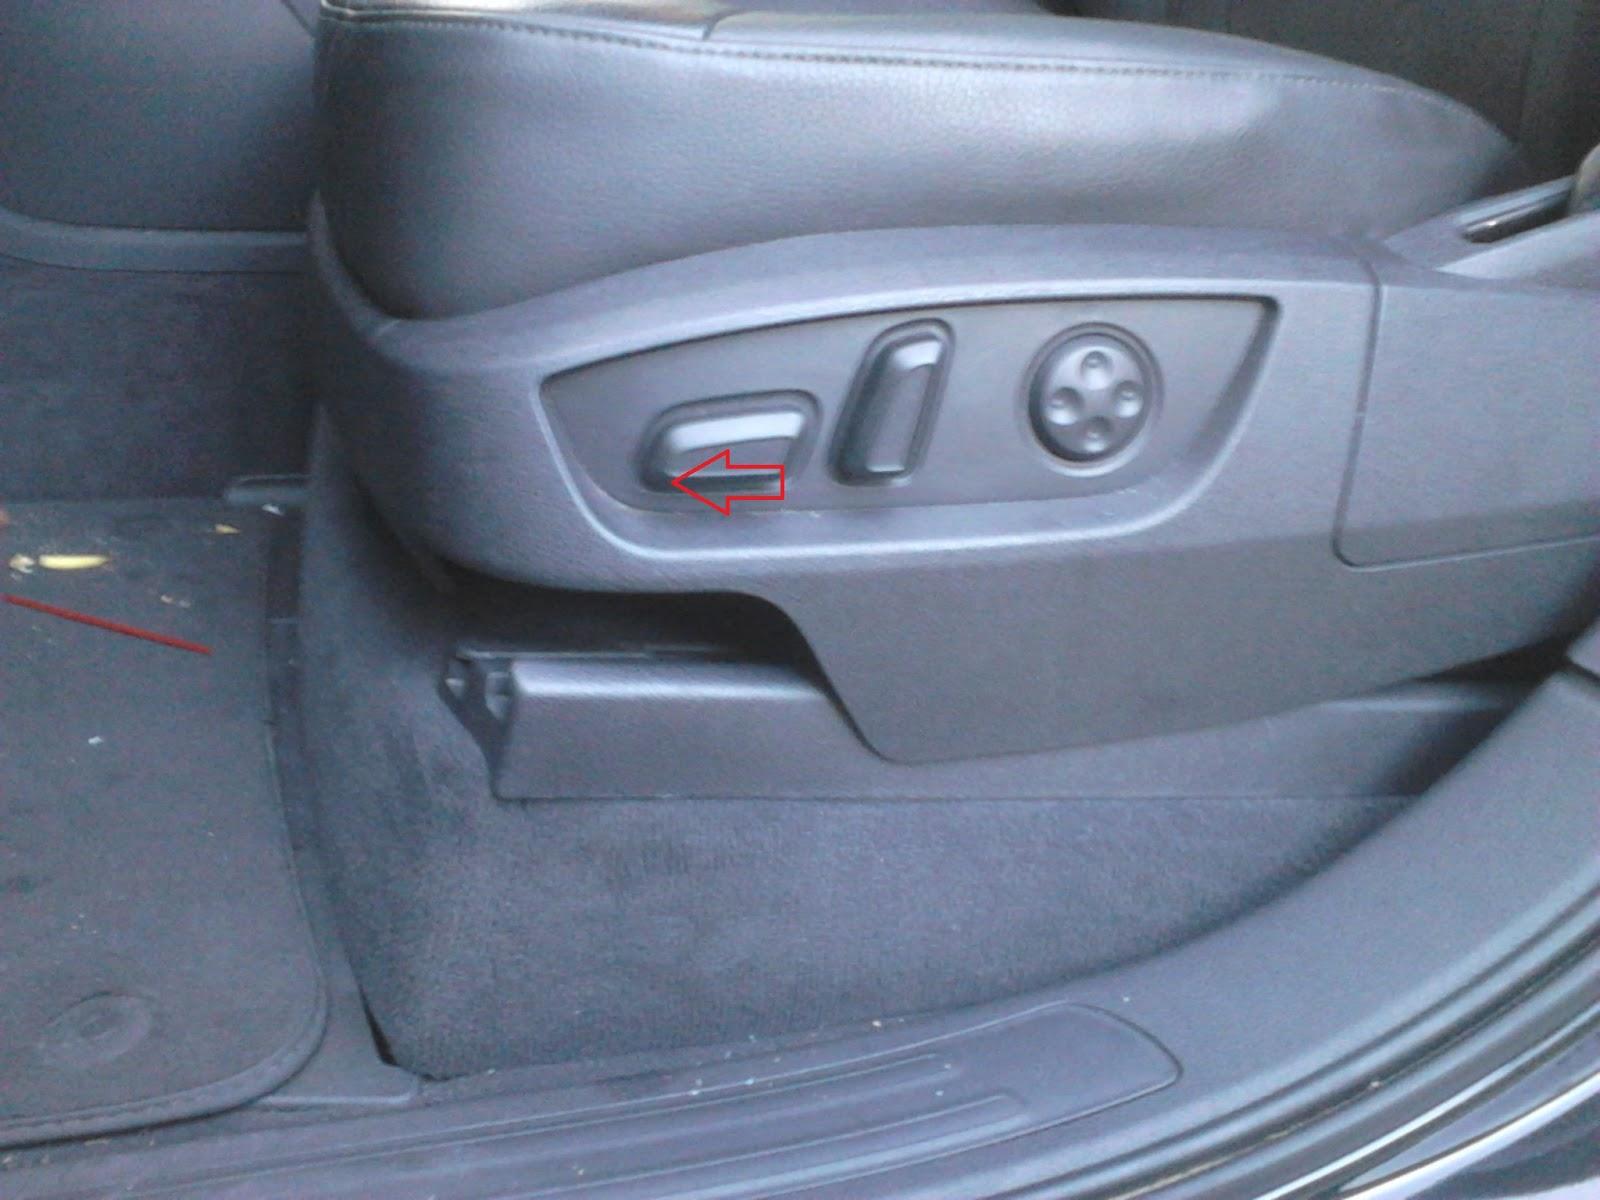 tom auto pro 2008 audi q7 battery change step by step. Black Bedroom Furniture Sets. Home Design Ideas